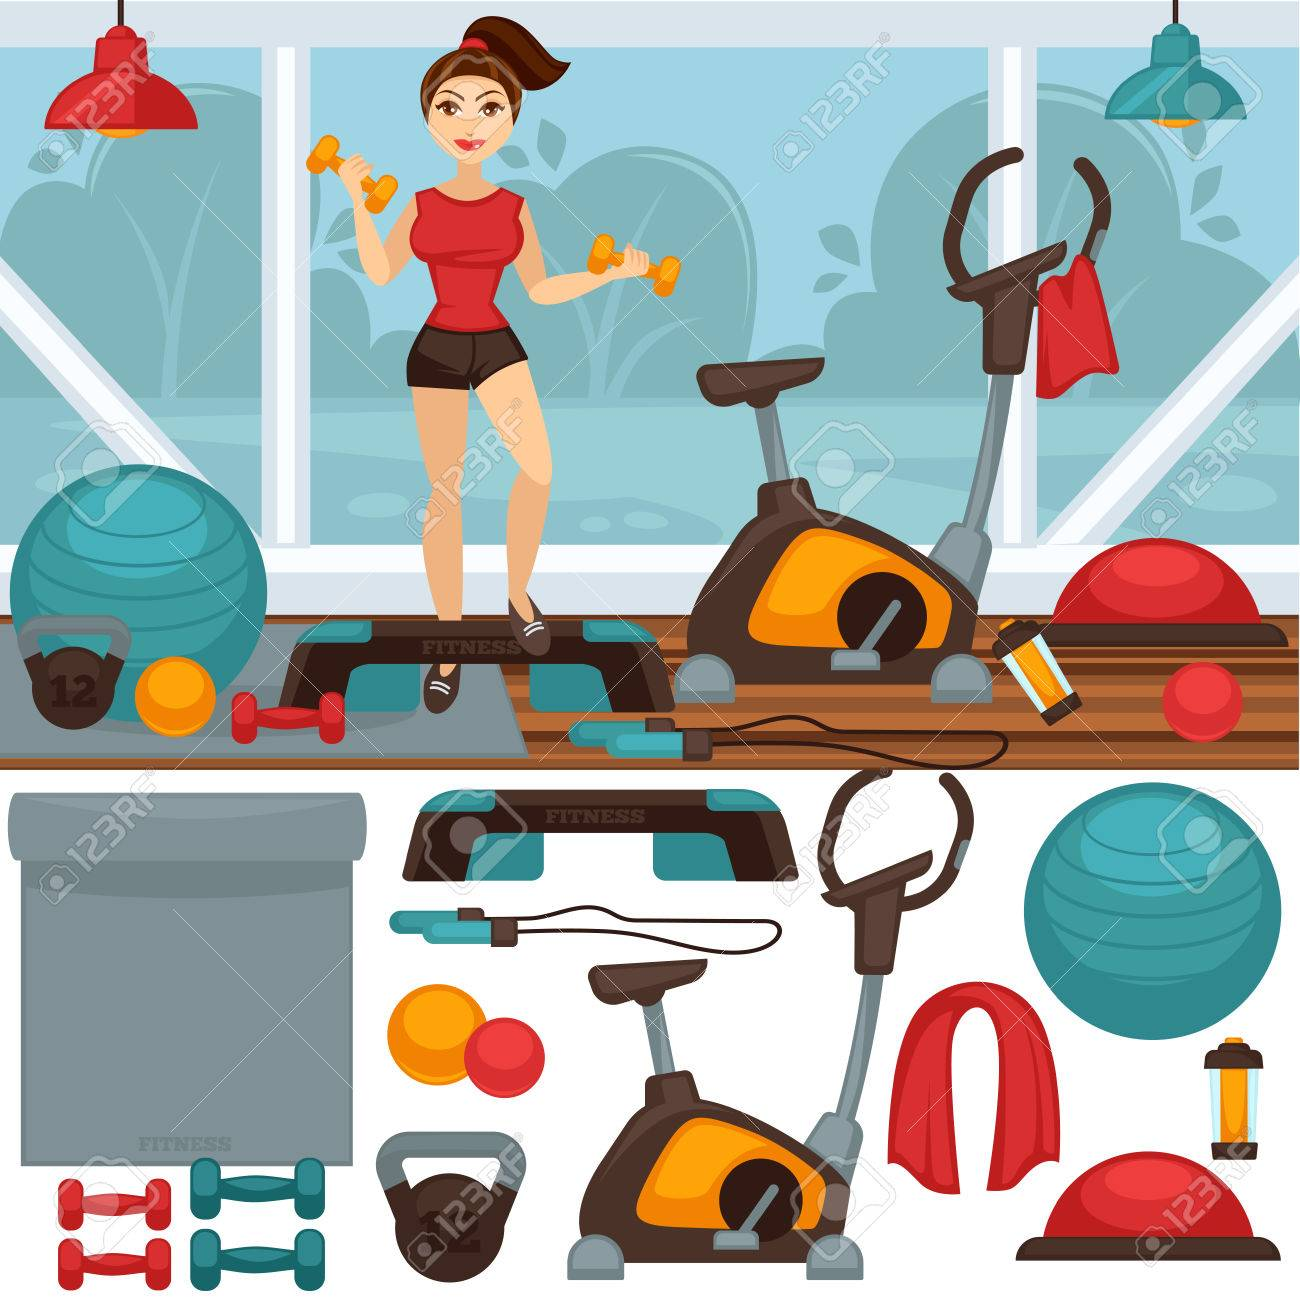 Home Fitness equipment and gym interior - 69487827